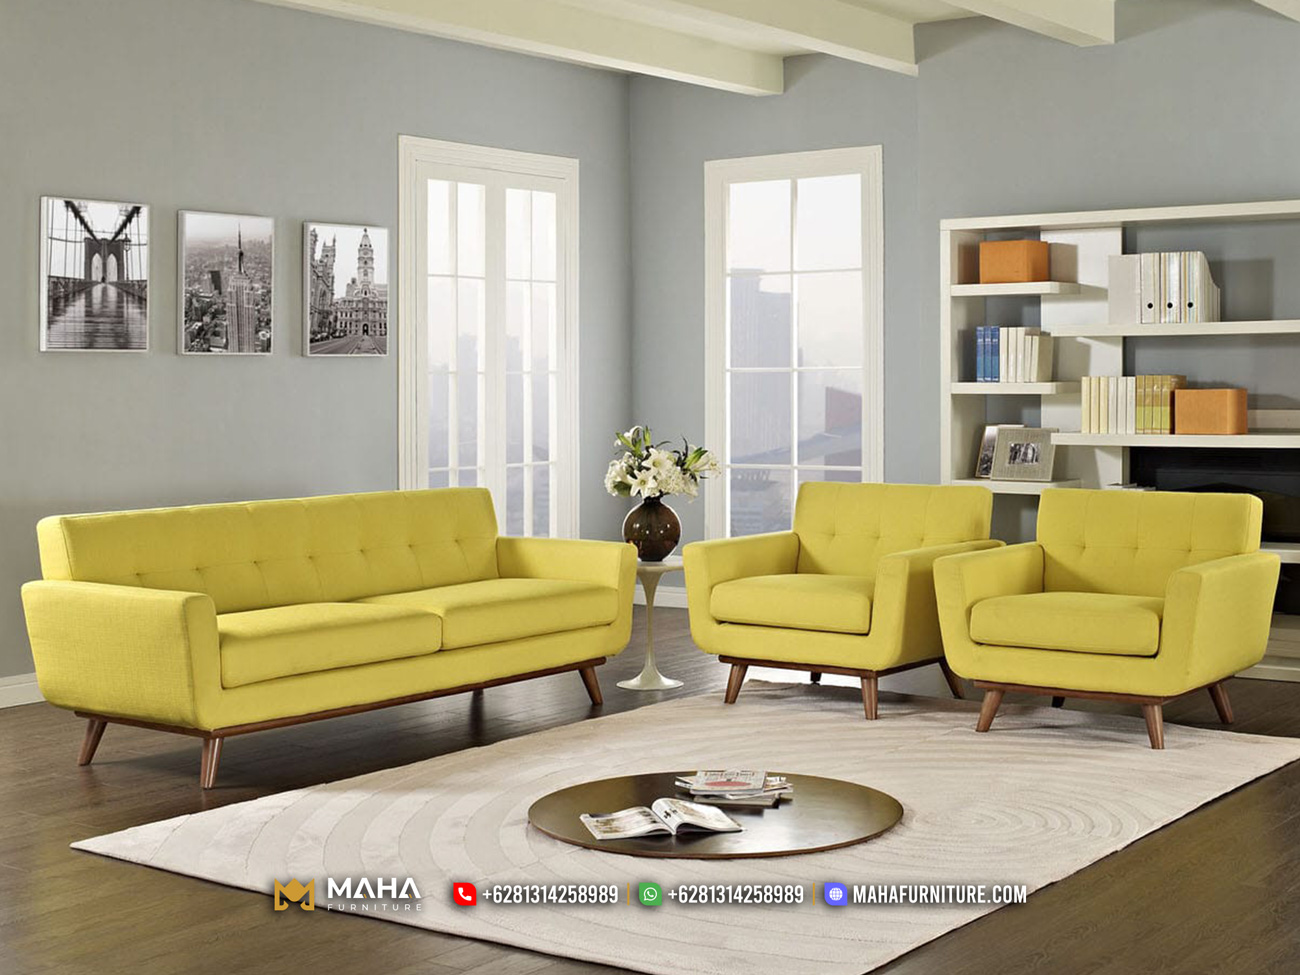 Diskon Sofa Tamu Minimalis Modern Jepara Excellent Mustard MF251